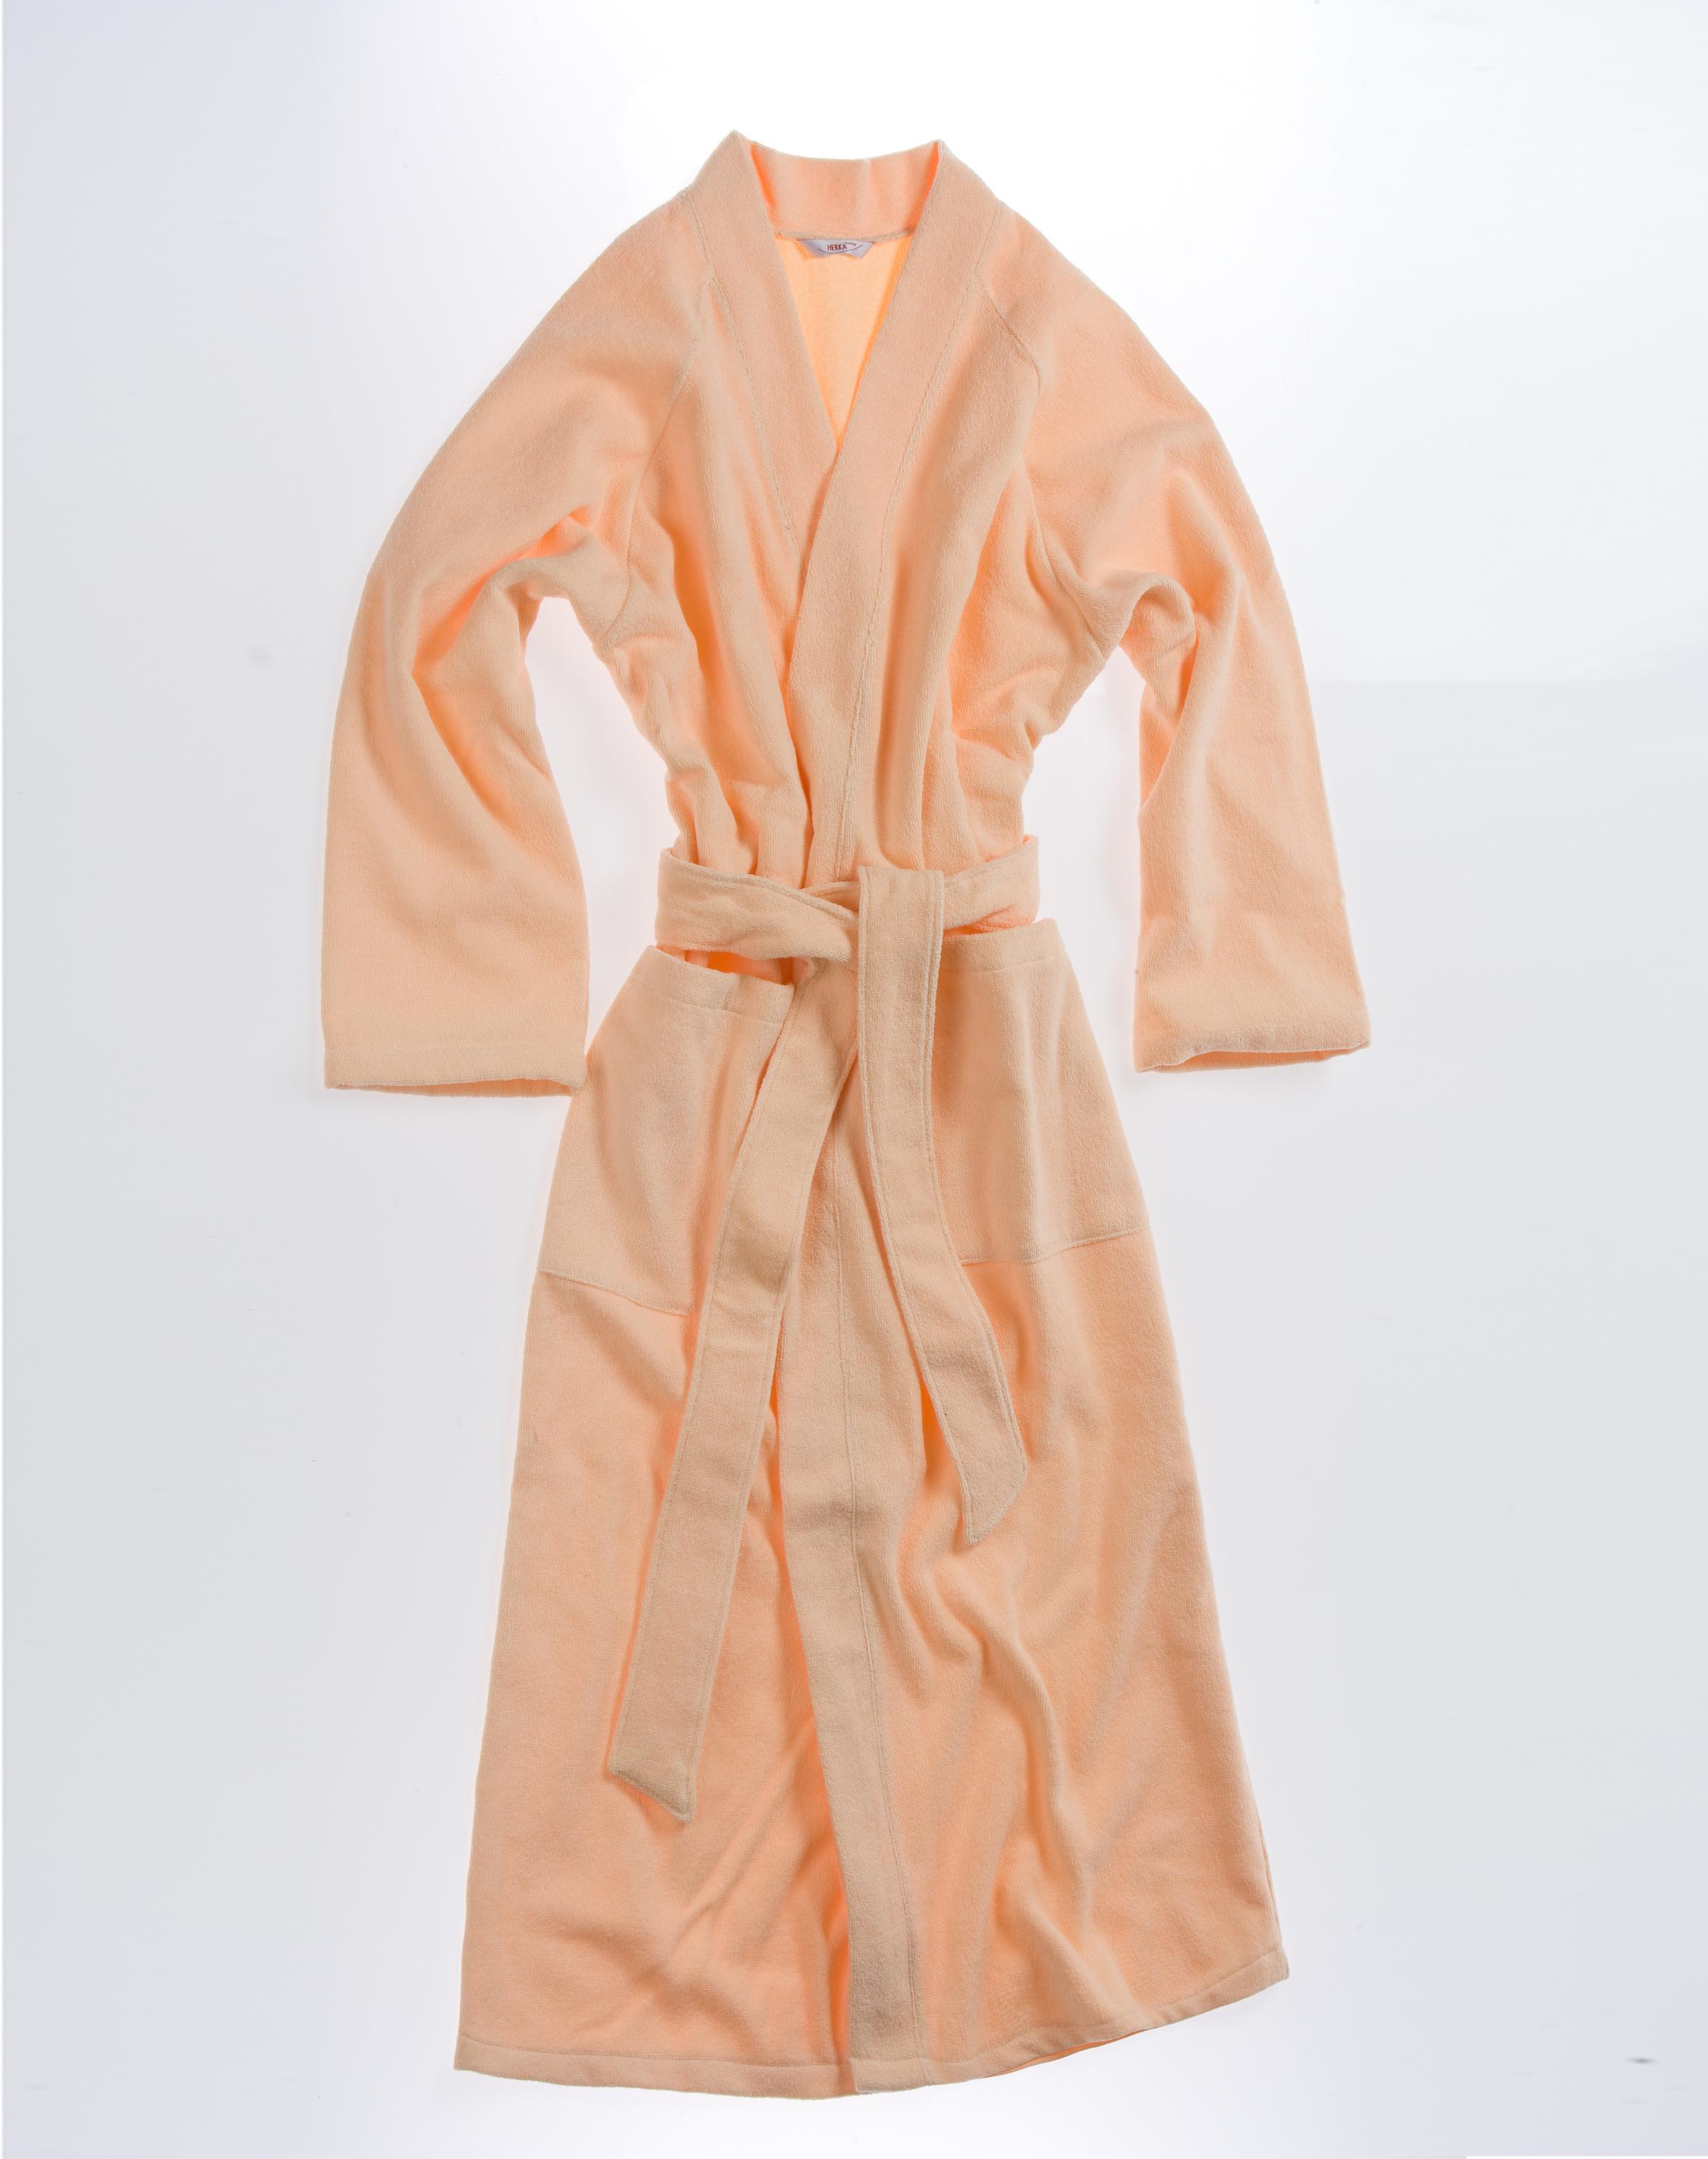 6304fa48bd solution-kimono-lang-Bademantel -herka-frottier-wellness-sauna-terry-towel-bath-robe-long-cotton-baumwolle